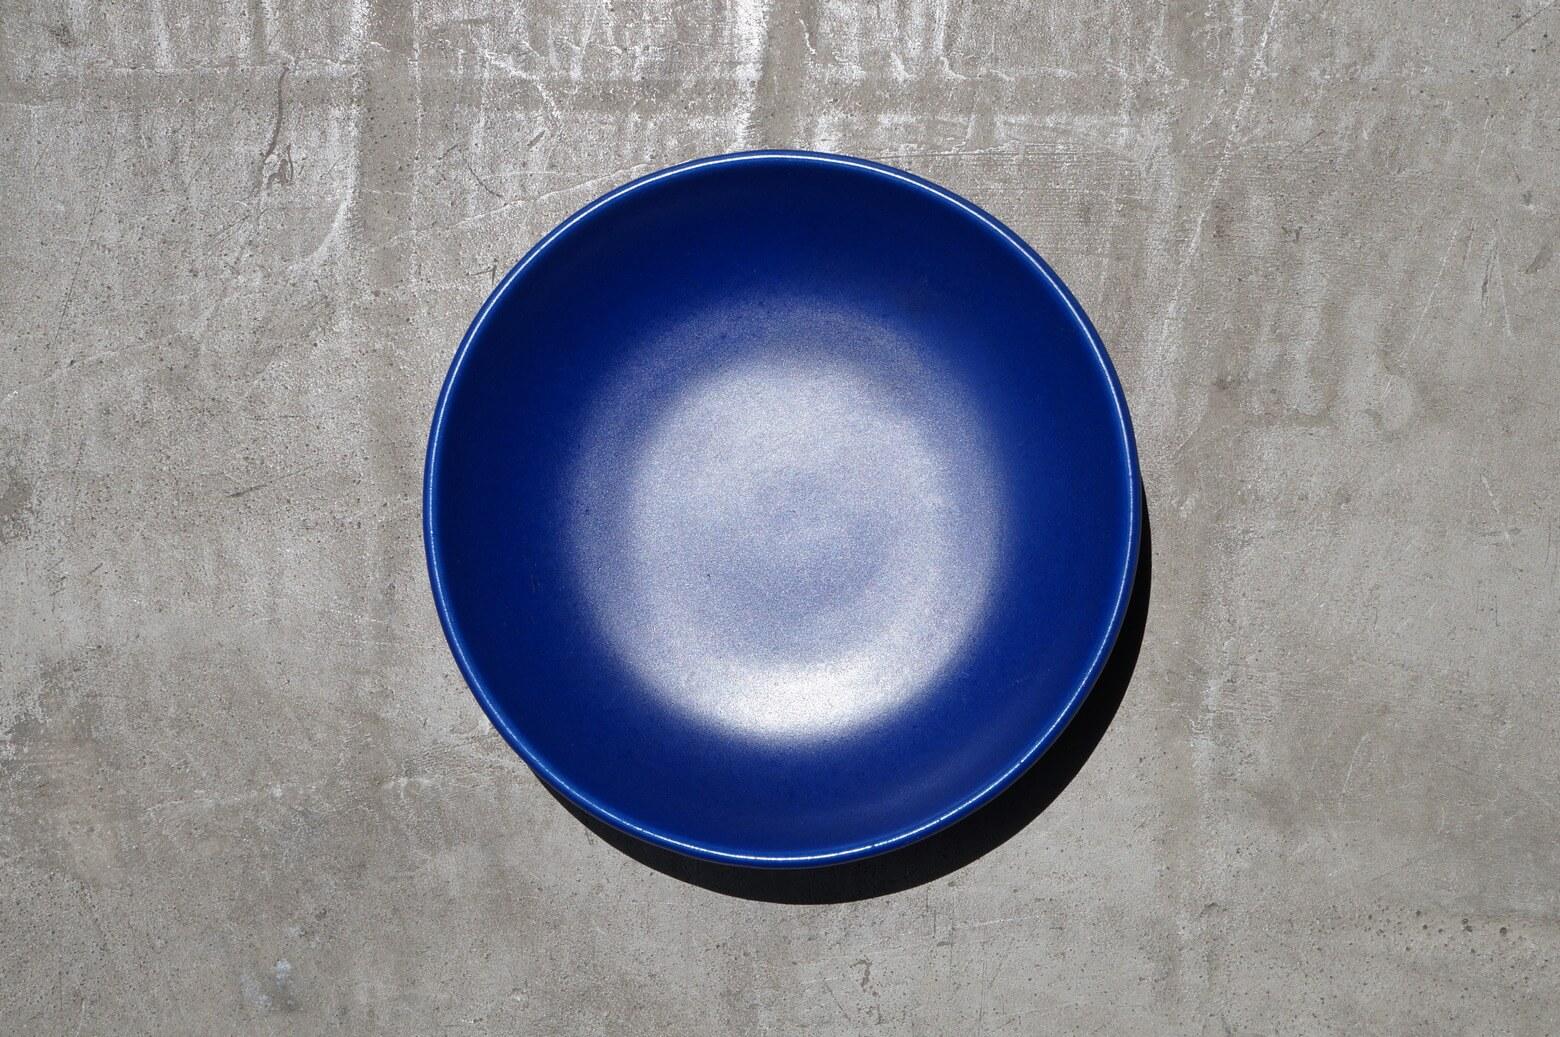 SILBERDISTEL FAYENSEN Blue Ornamental plate / 西ドイツ製 オーナメントプレート